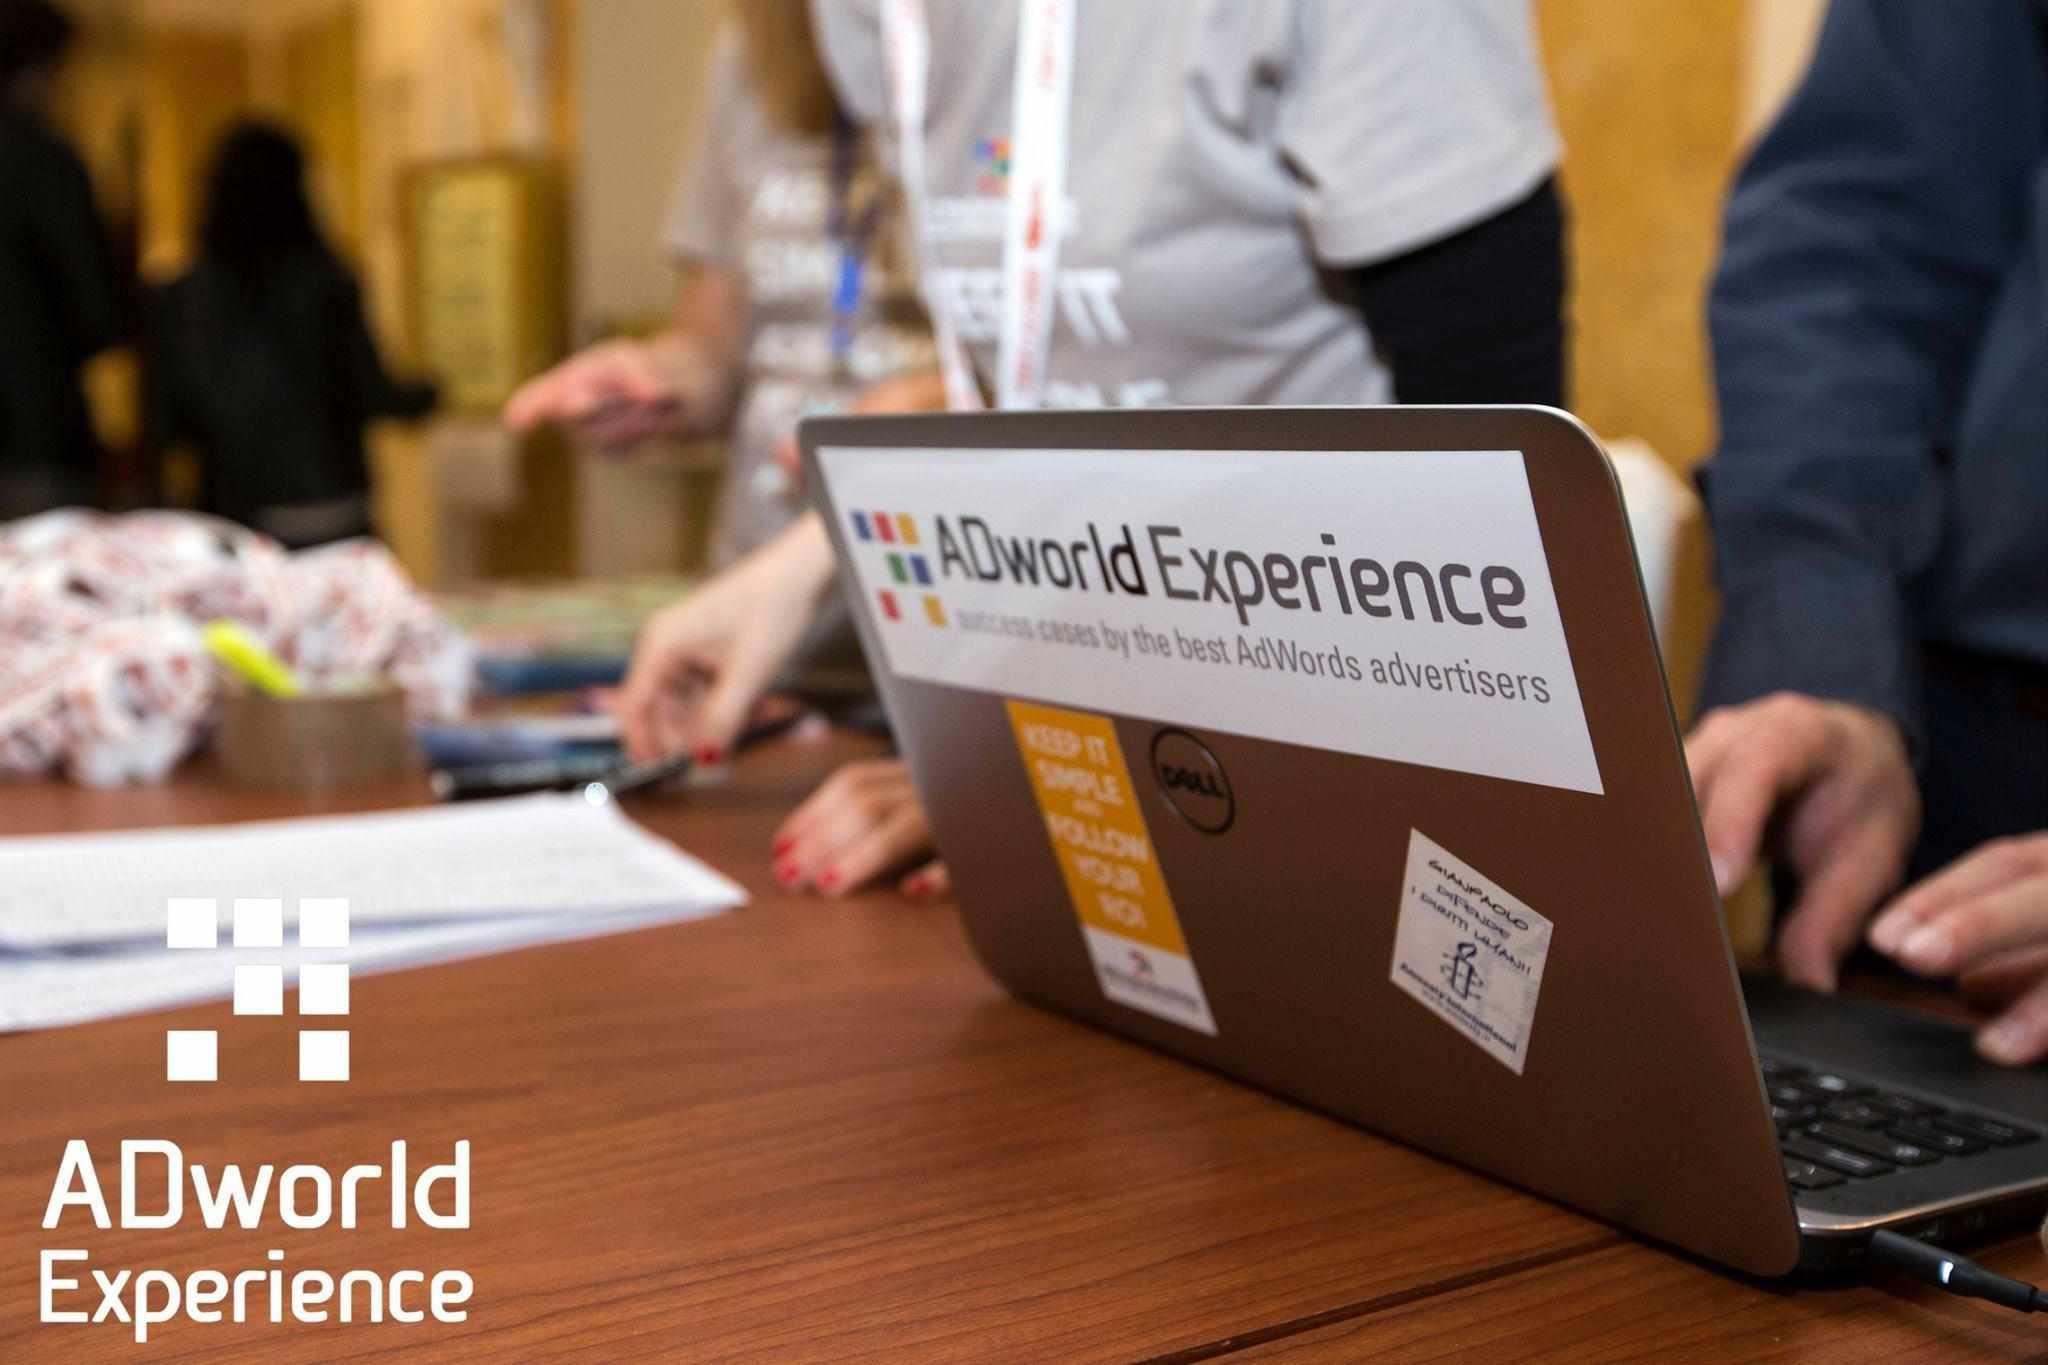 ADworld Experience 2018: partecipa all'evento con lo sconto Ninja!